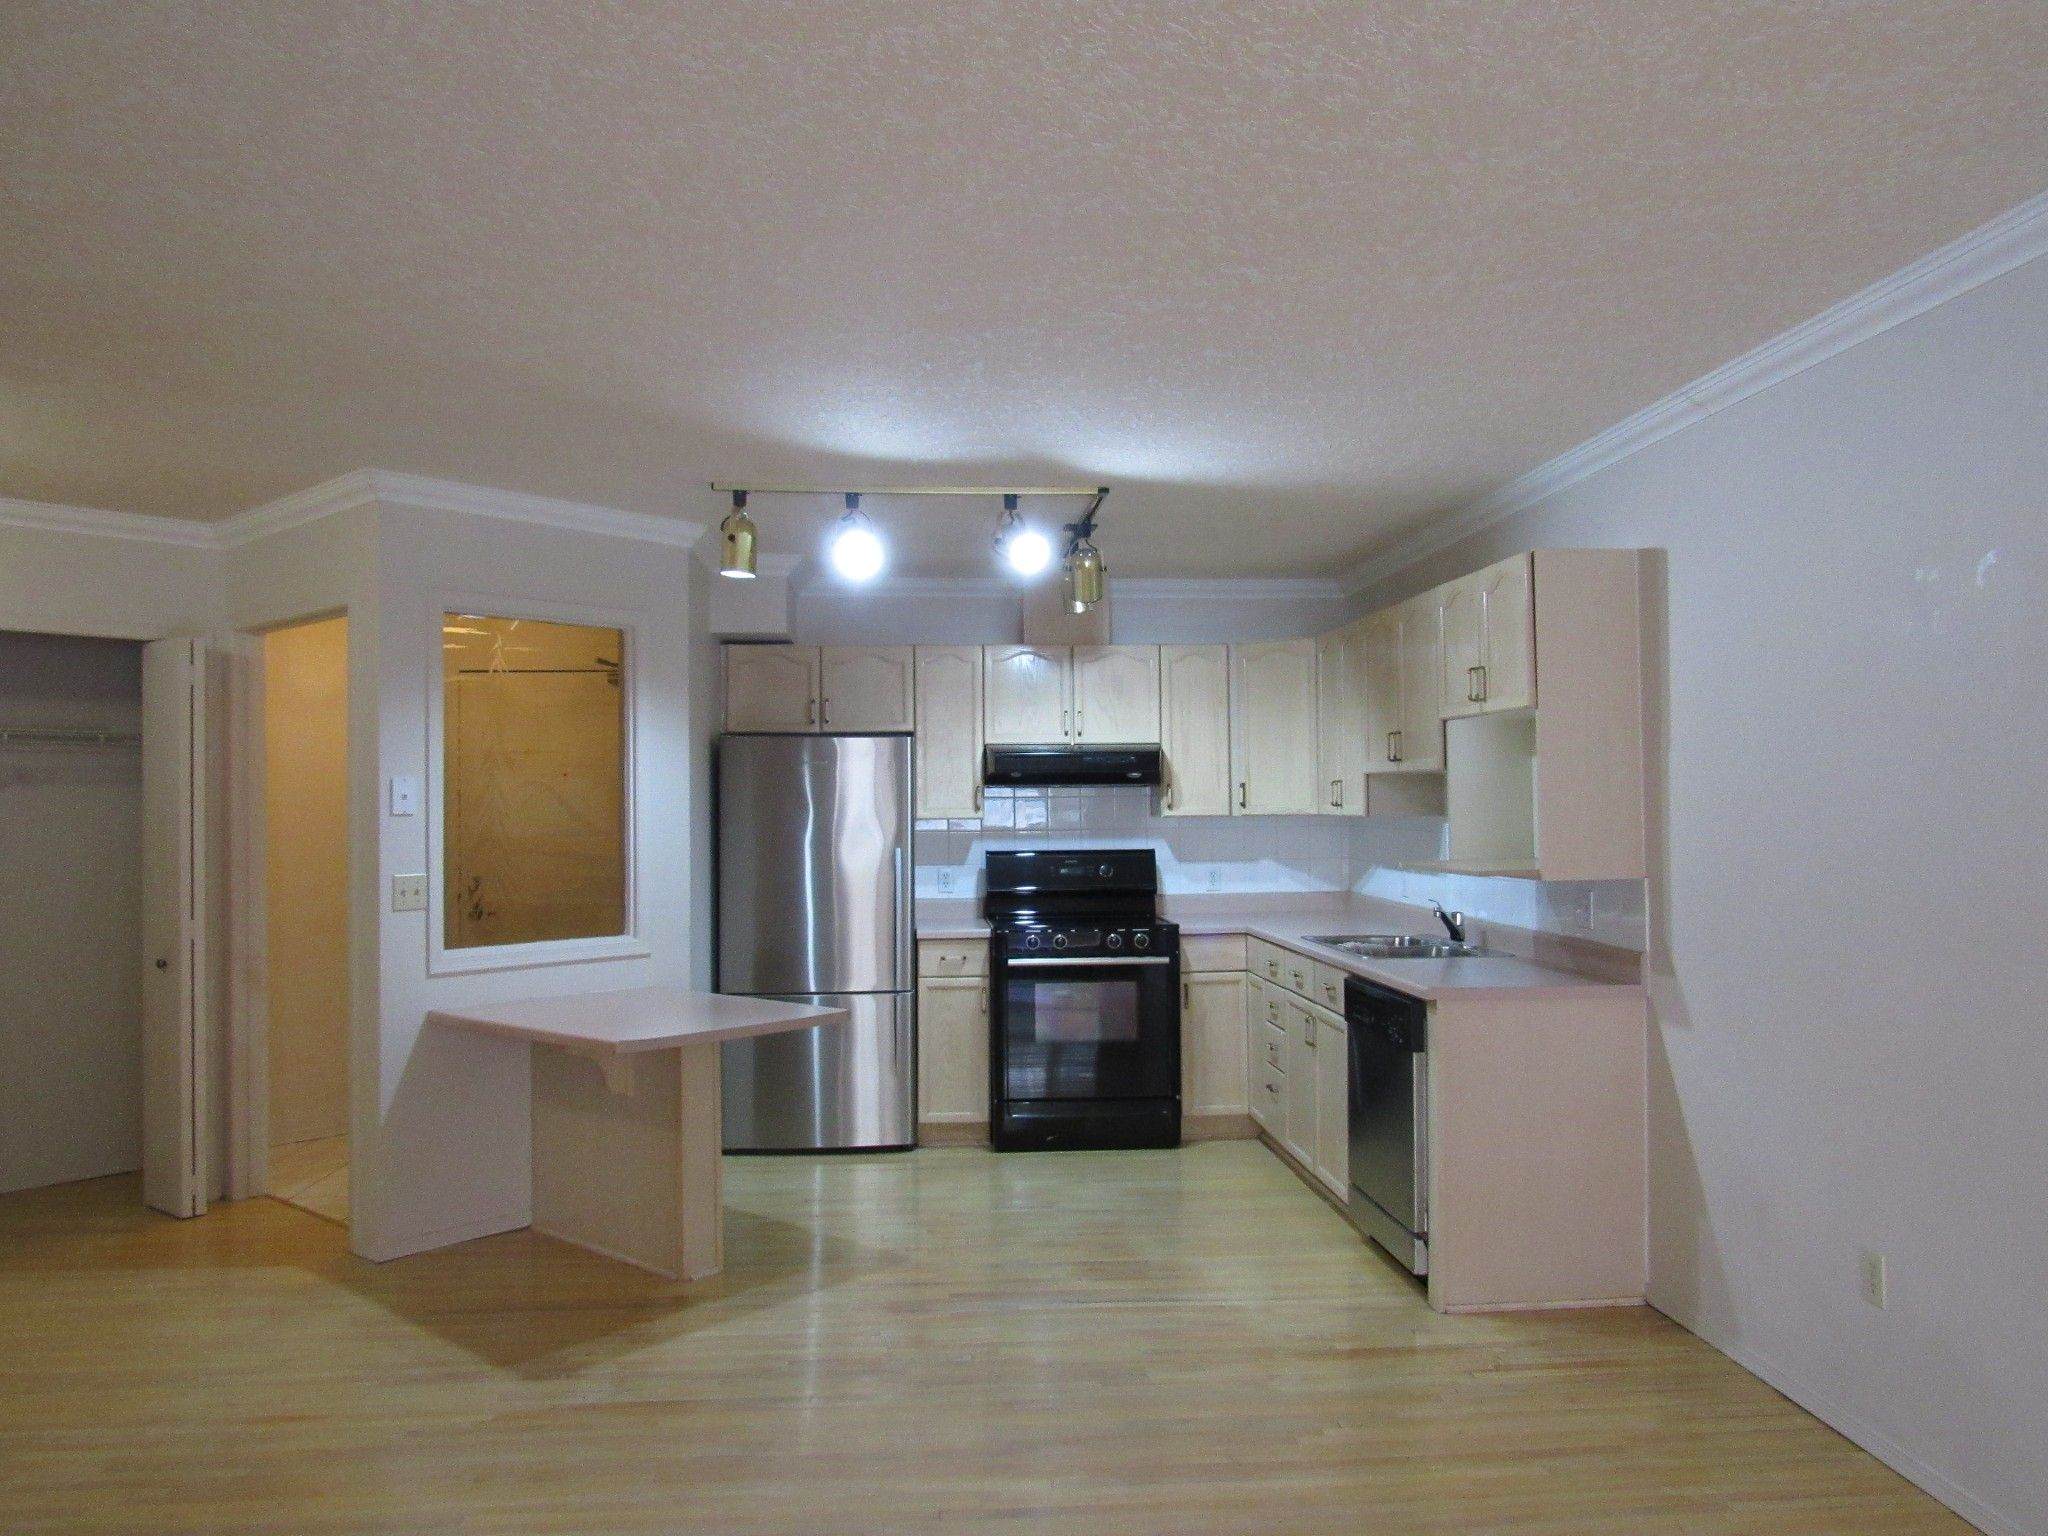 Main Photo: 205, 3 Perron Street in St. Albert: Condo for rent